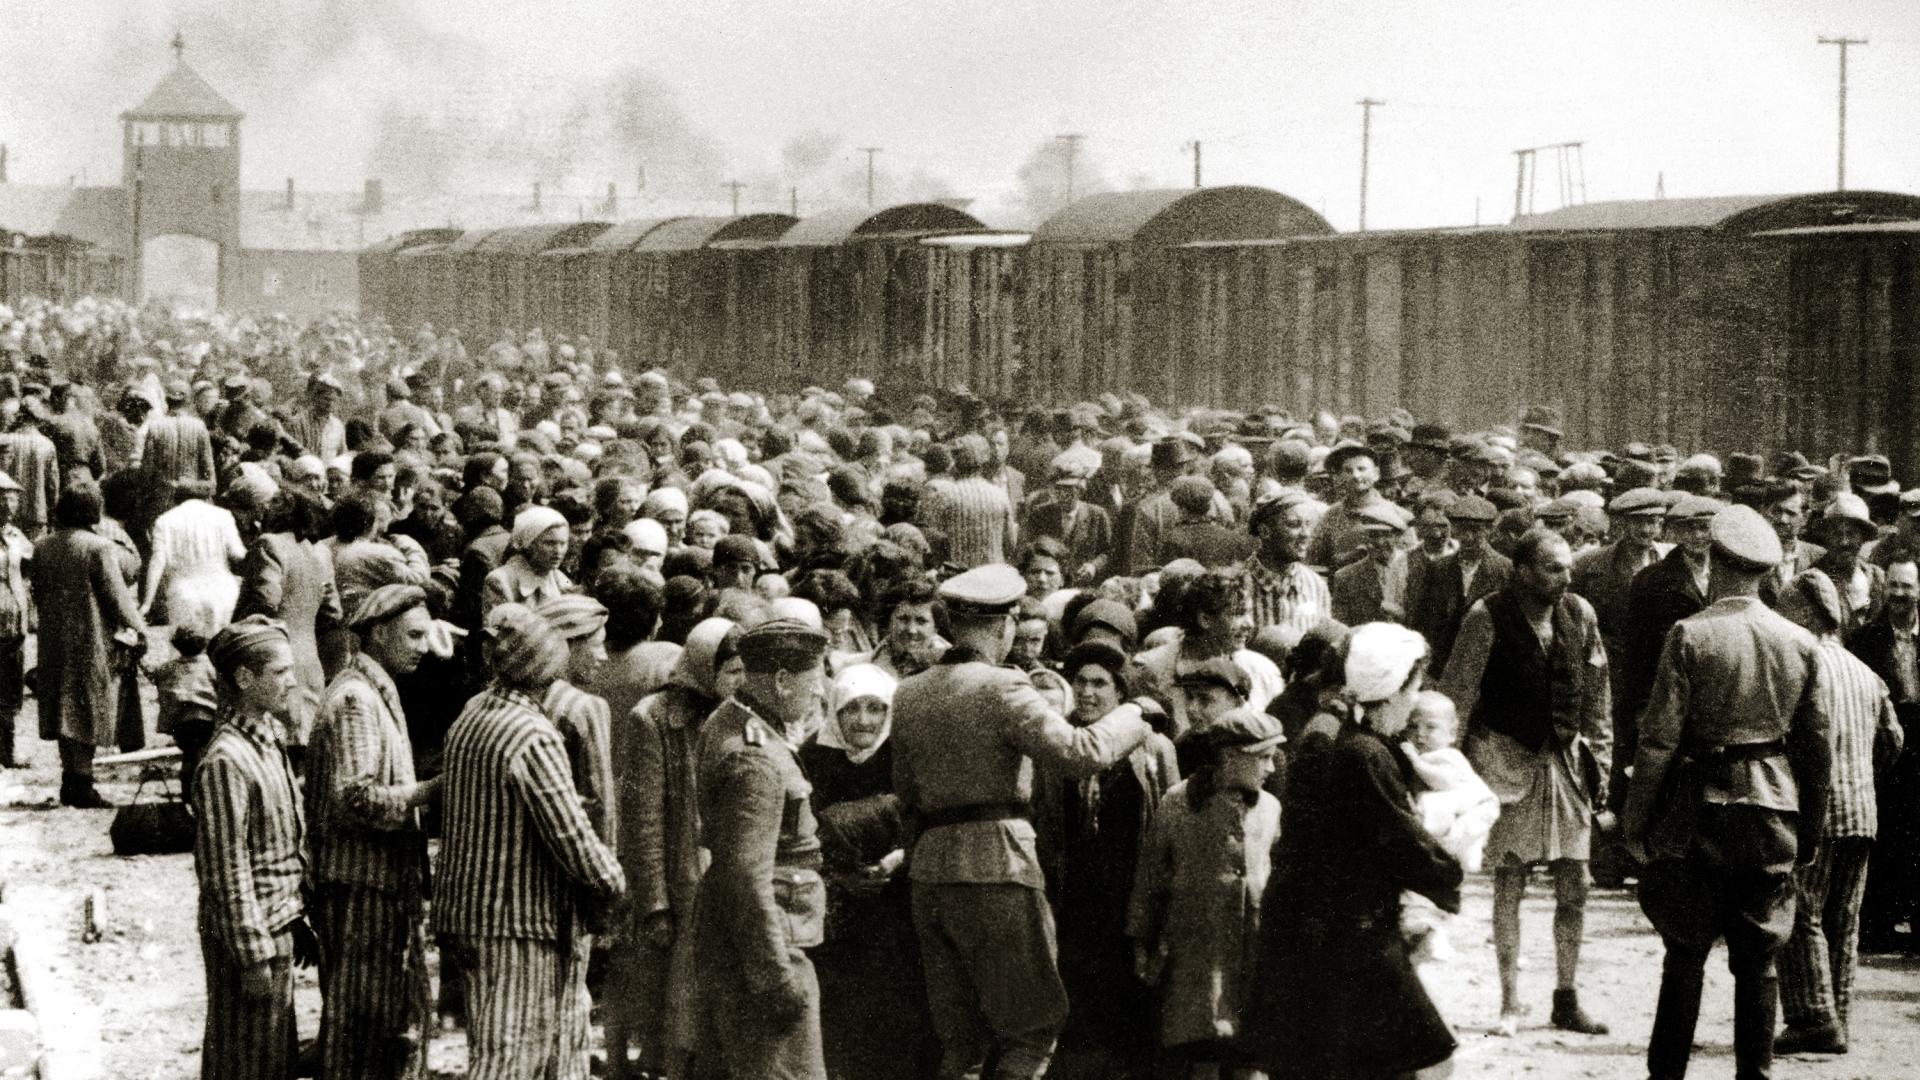 The arrival of Hungarian Jews in Auschwitz-Birkenau, in German-occupied Poland, June 1944. (Credit: Galerie Bilderwelt/Getty Images)